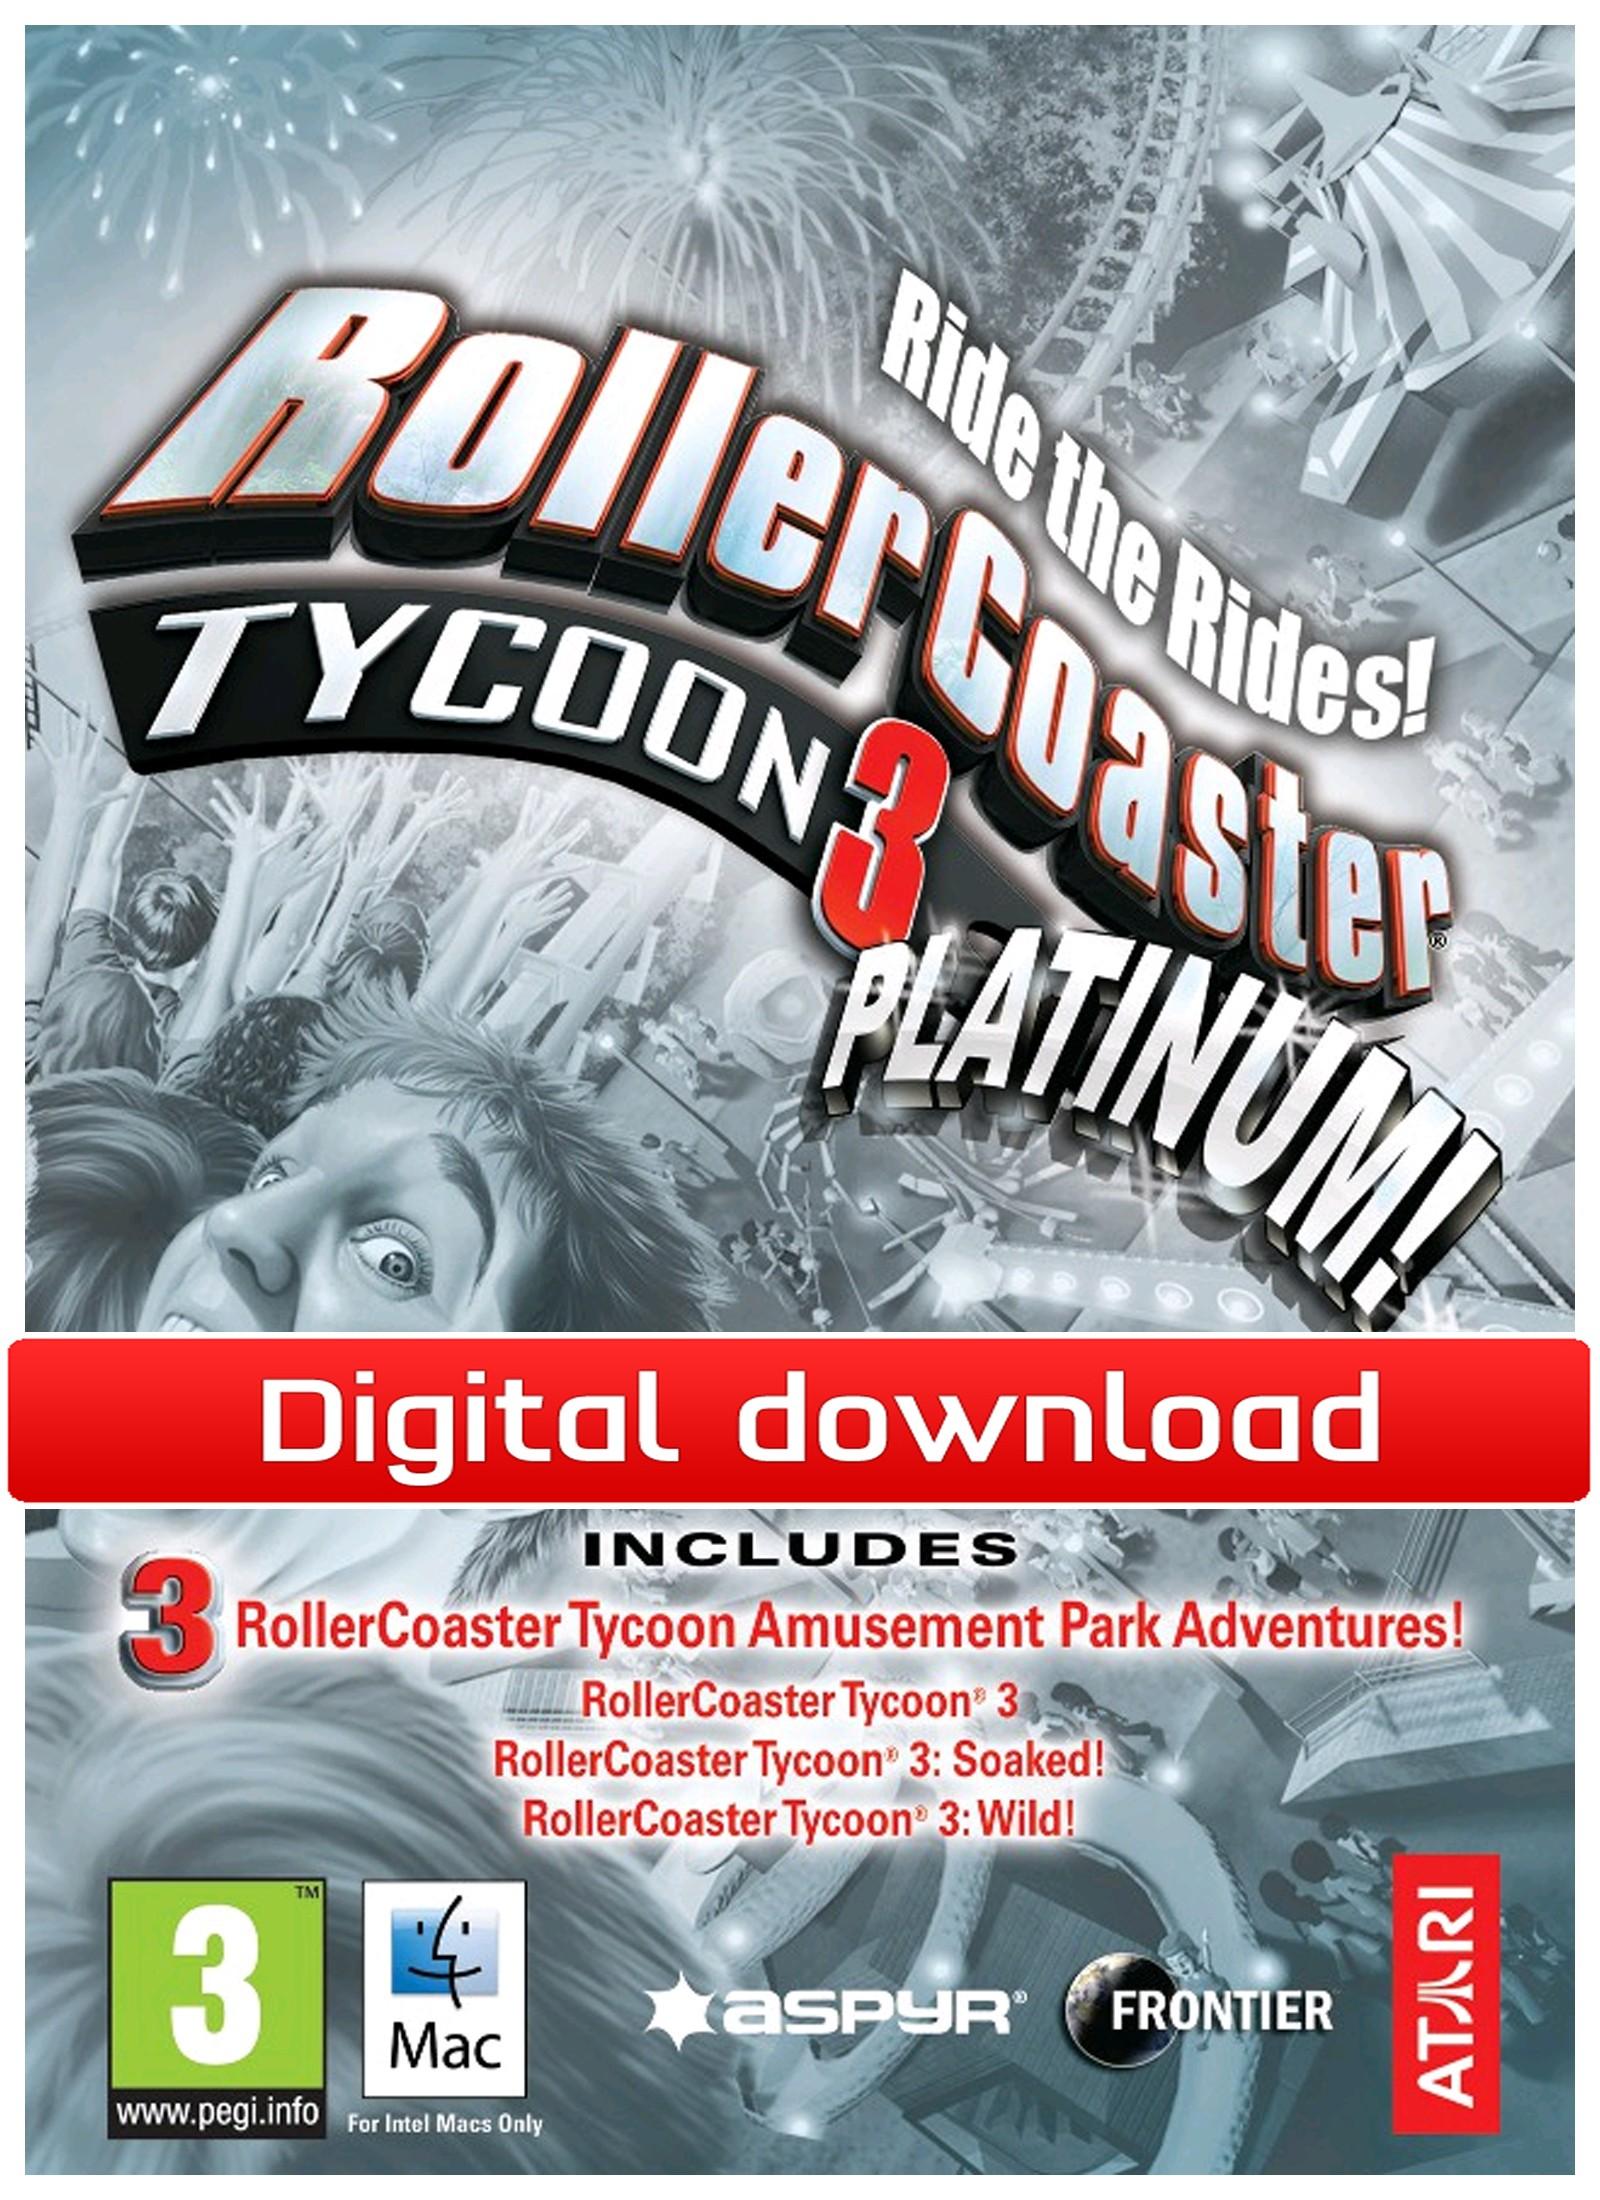 RollerCoaster Tycoon 3: Platinum (Mac nedlastning) PCDD31301